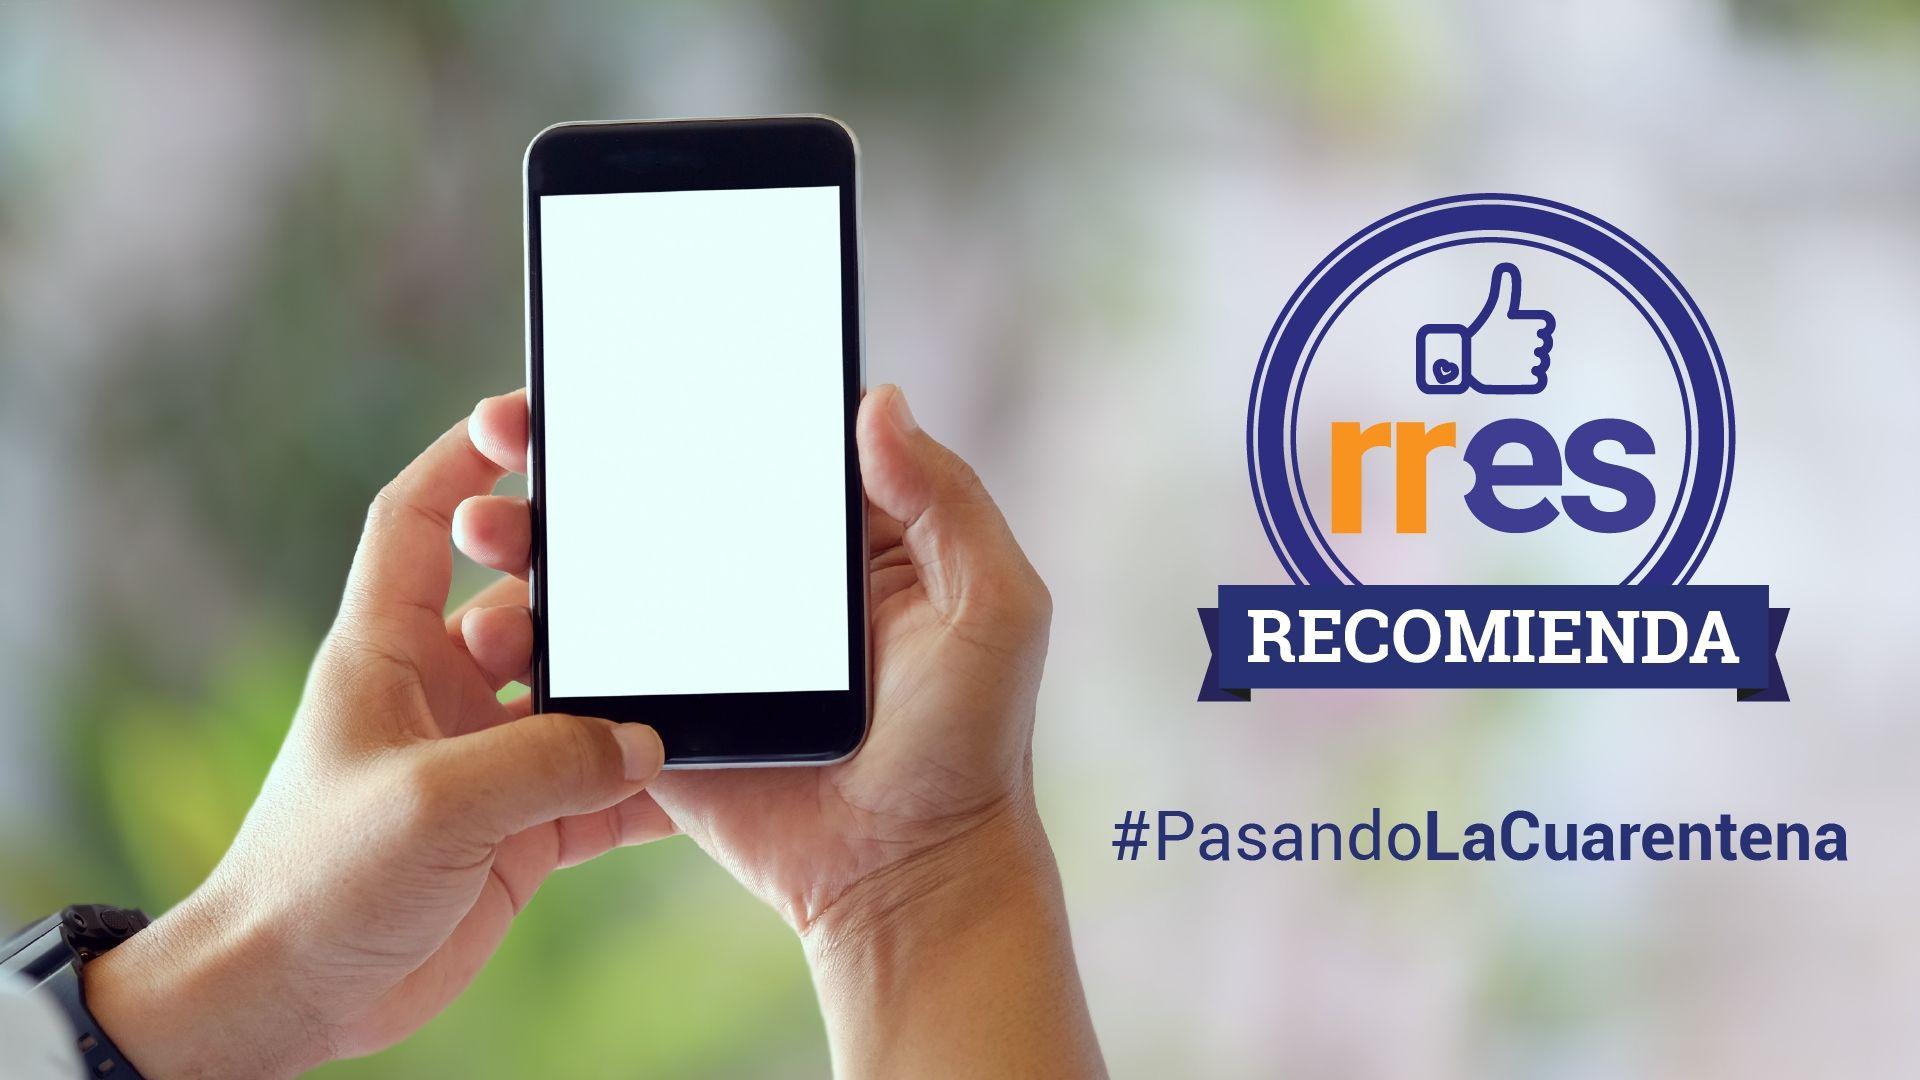 #PasandoLaCuarentena | 10 frases que todas las personas aman escuchar